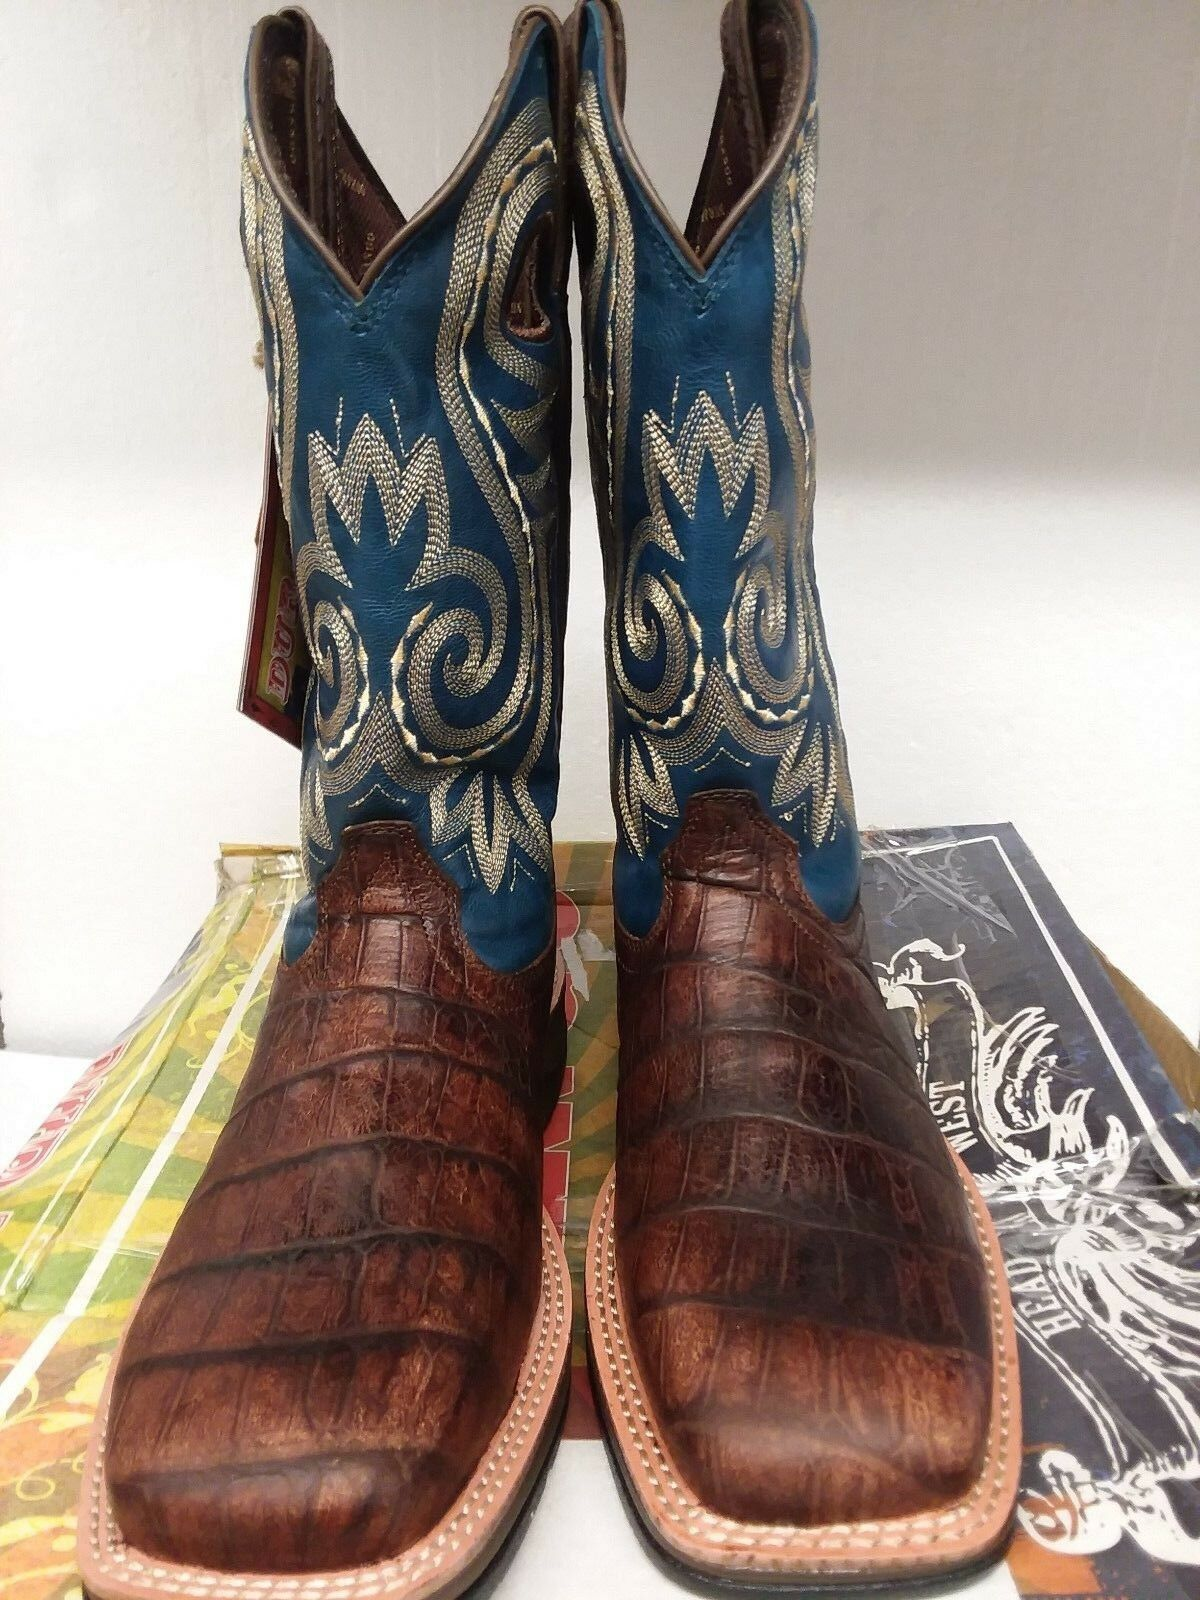 DDB0096 Rebel by Durango, Men's Western Cowboy Boot, Navy & Brown, US; 8M